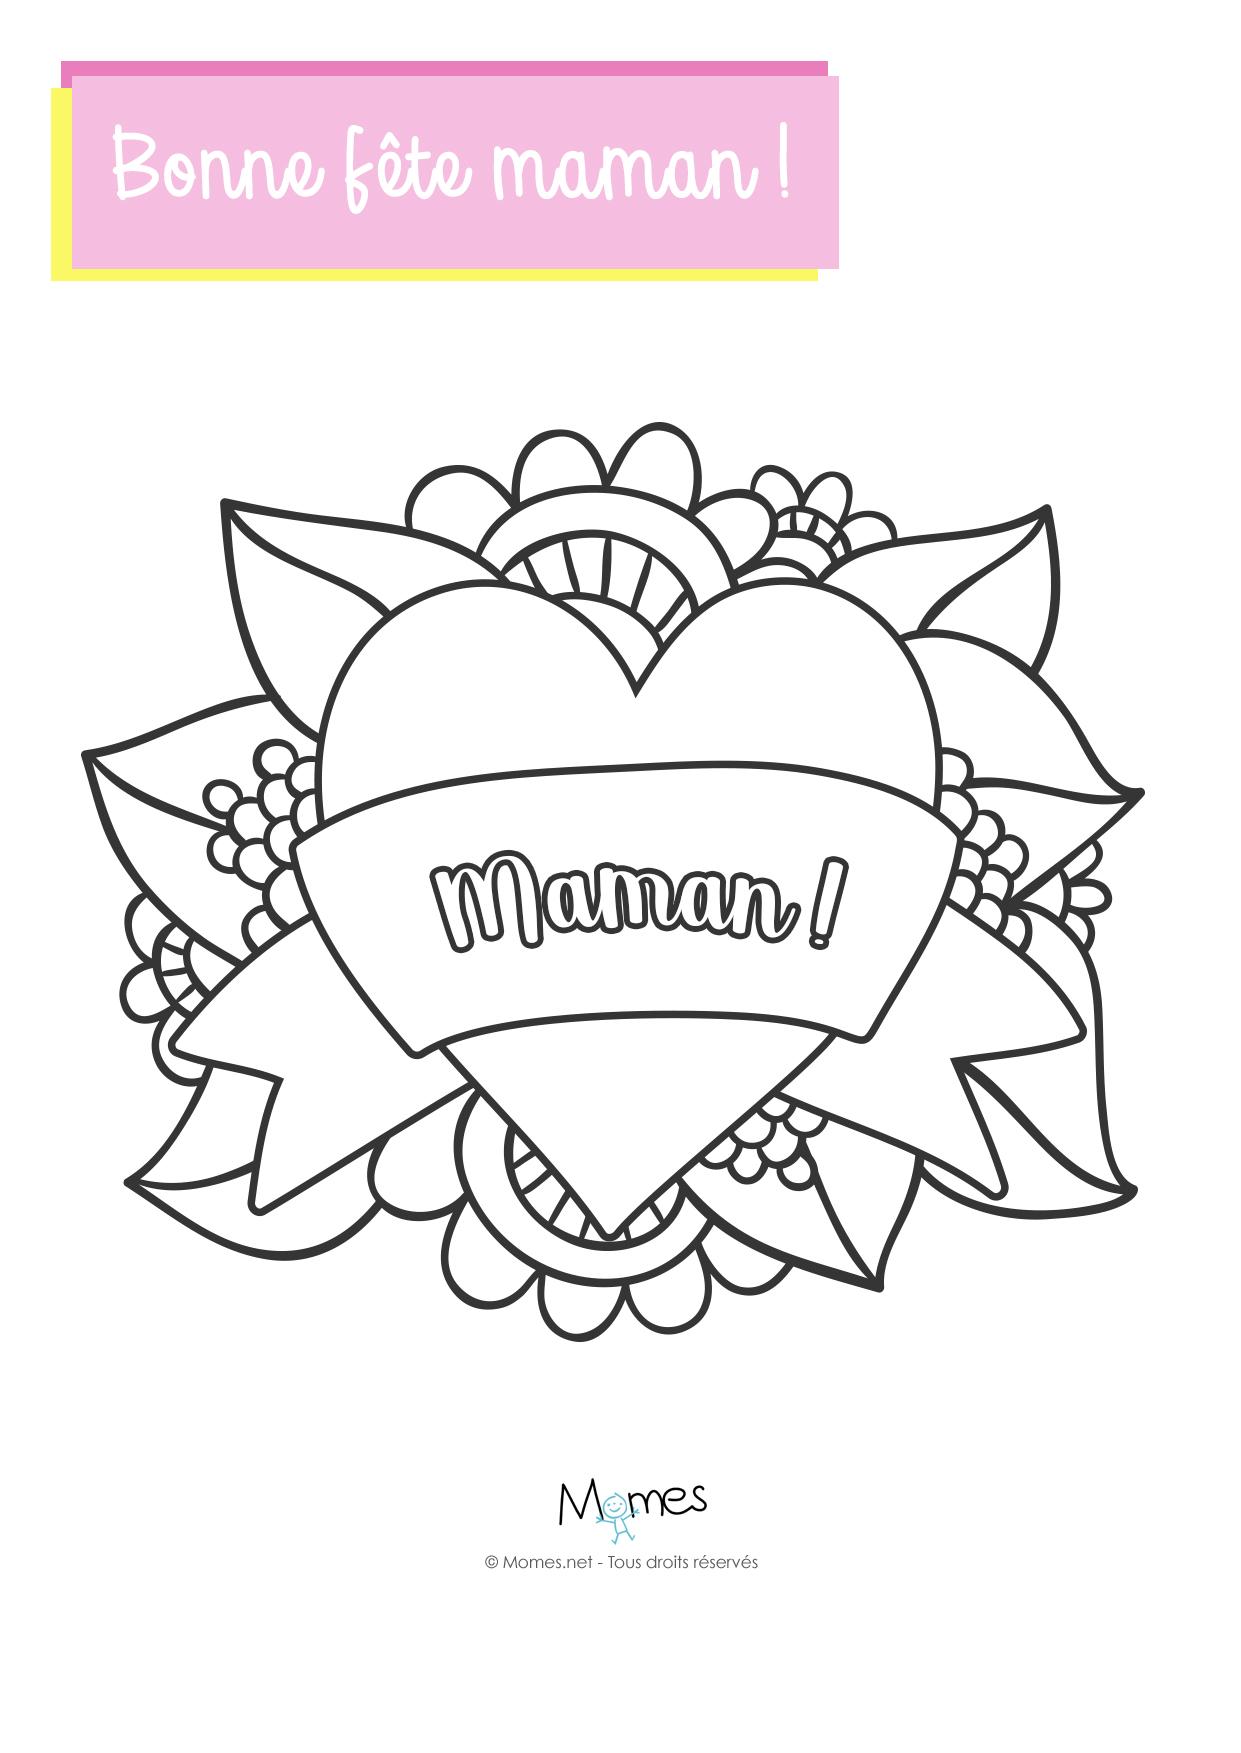 Coloriage joli coeur pour maman - Coeur coloriage ...